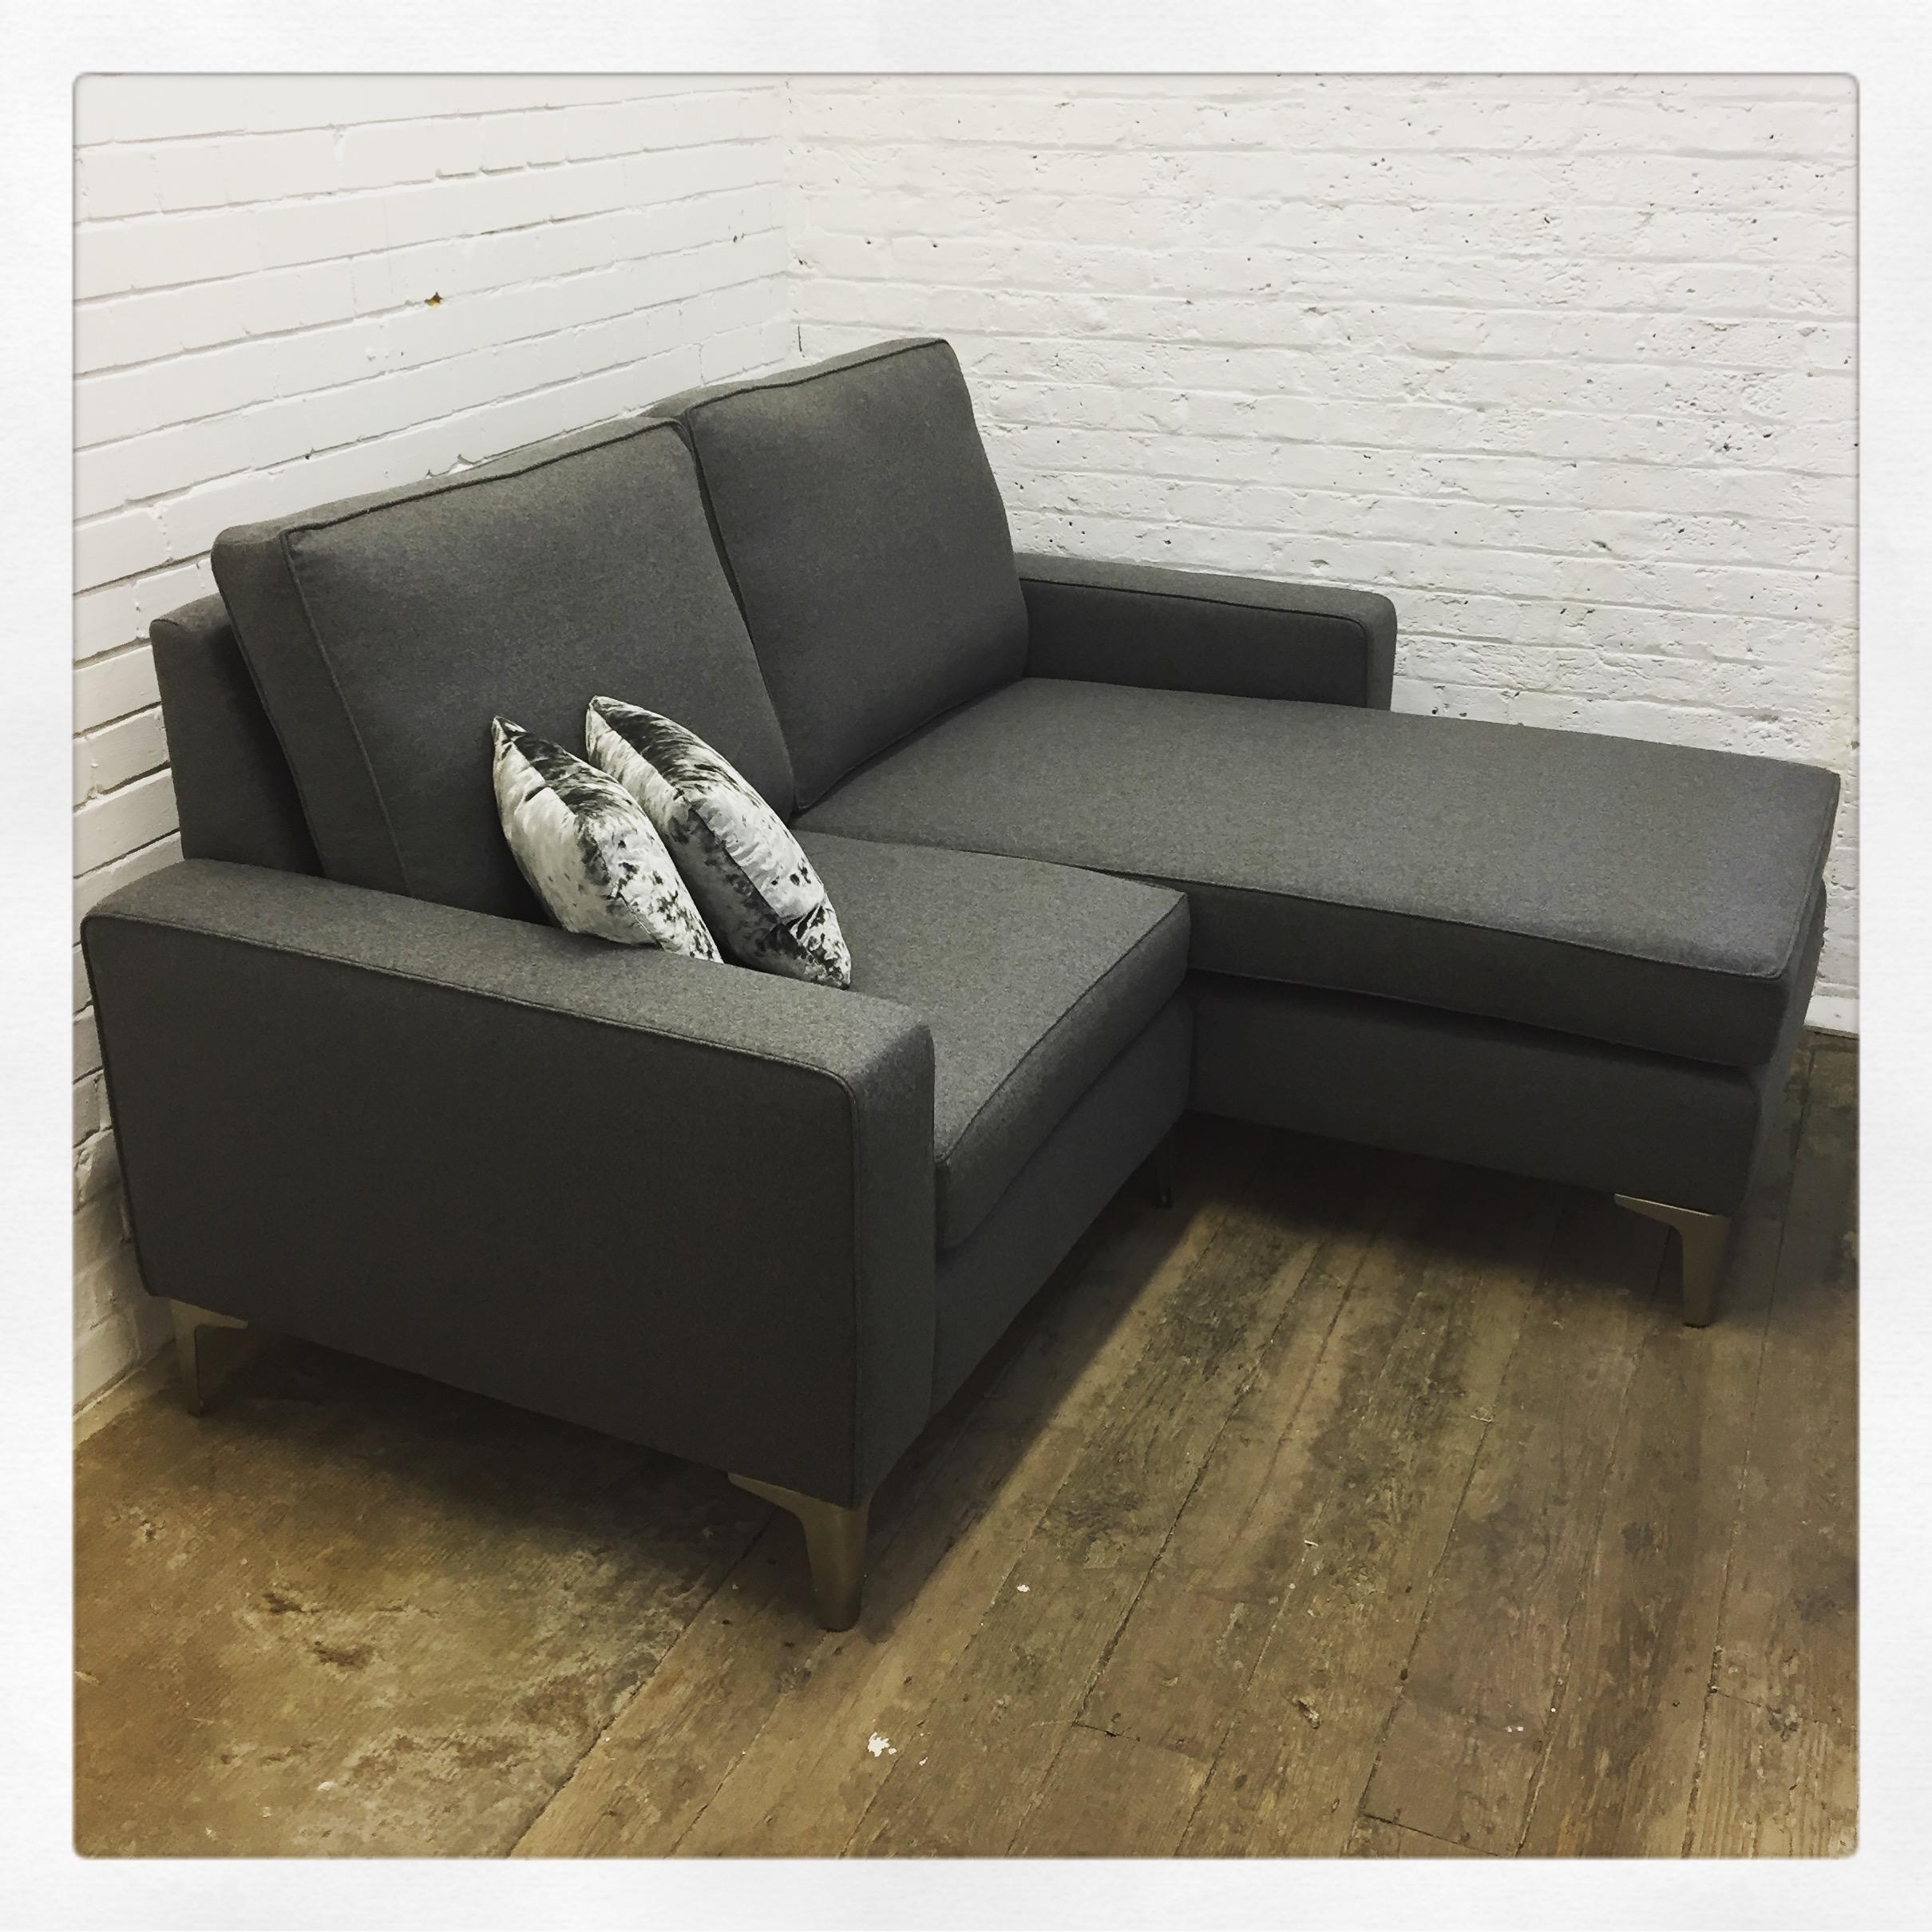 bespoke furniture design london